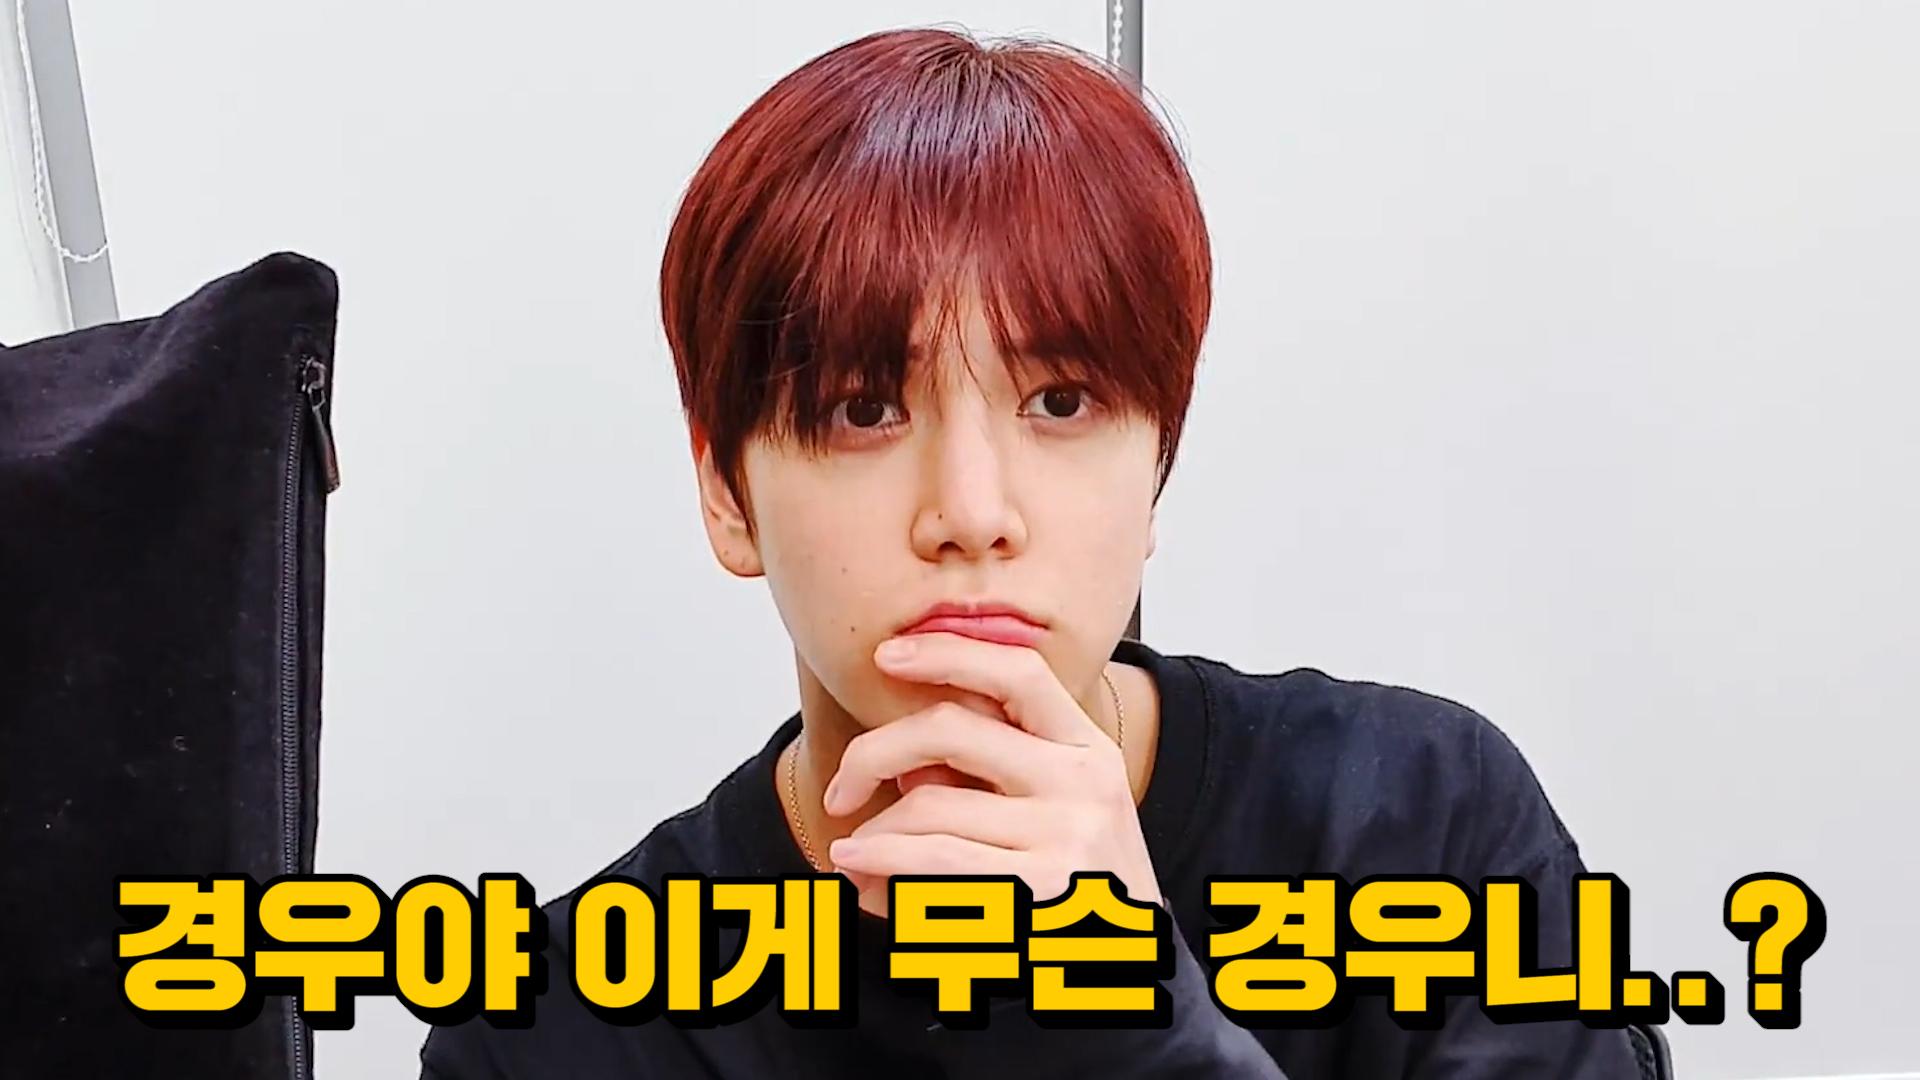 [THE BOYZ] 이게 무슨 경우니⁉️ 세계 최고 깜찍 빵경우요❣️🍞 (YOUNGHOON talking about drama role)